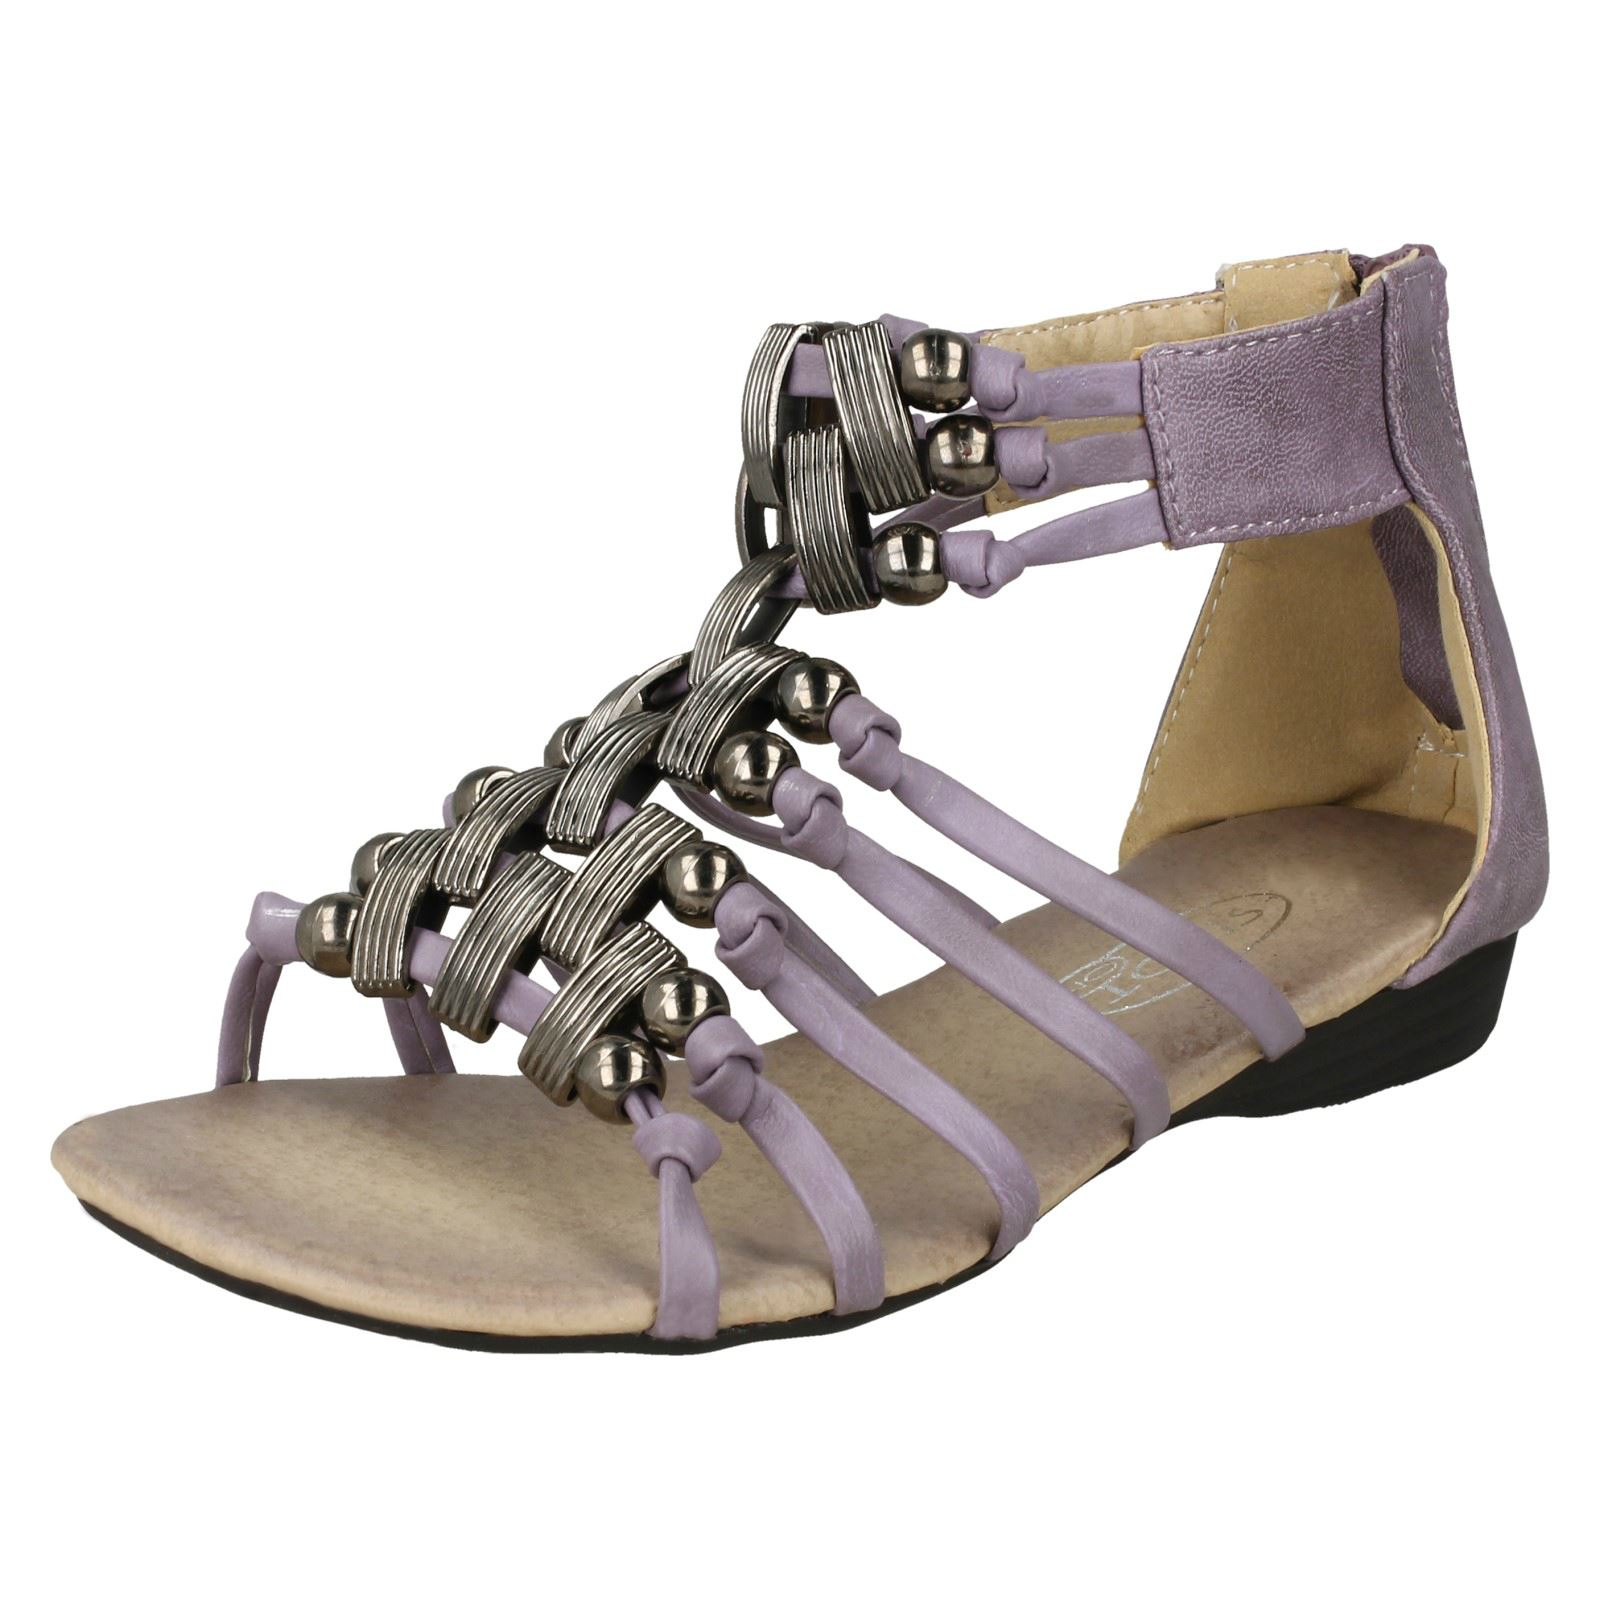 Girls Spot On Heeled Gladiator *Sandals*